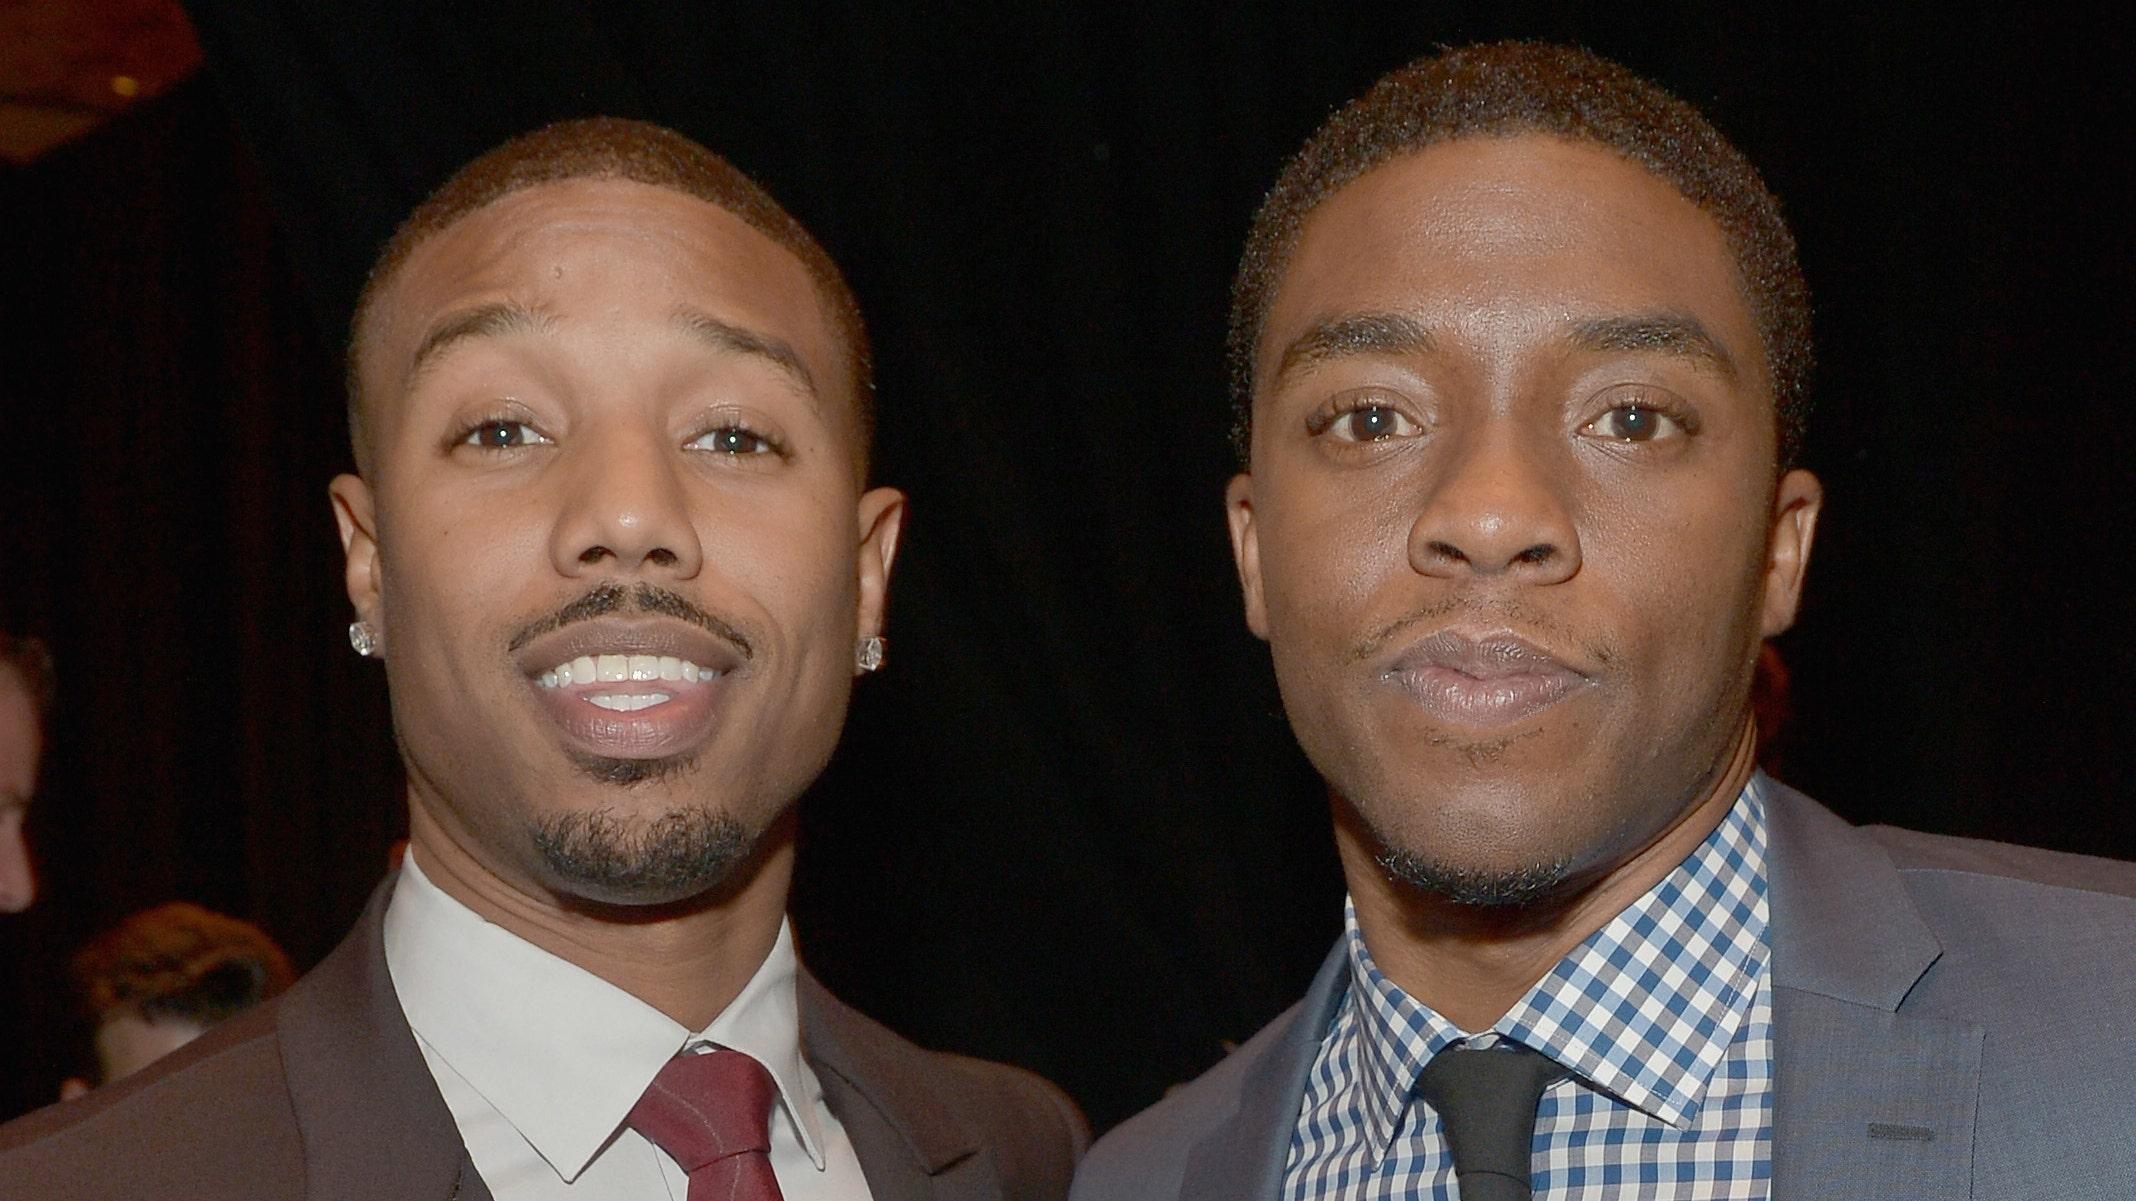 Chadwick Boseman's 'Black Panther' co-star Michael B. Jordan 'struggling' following actor's death – Fox News